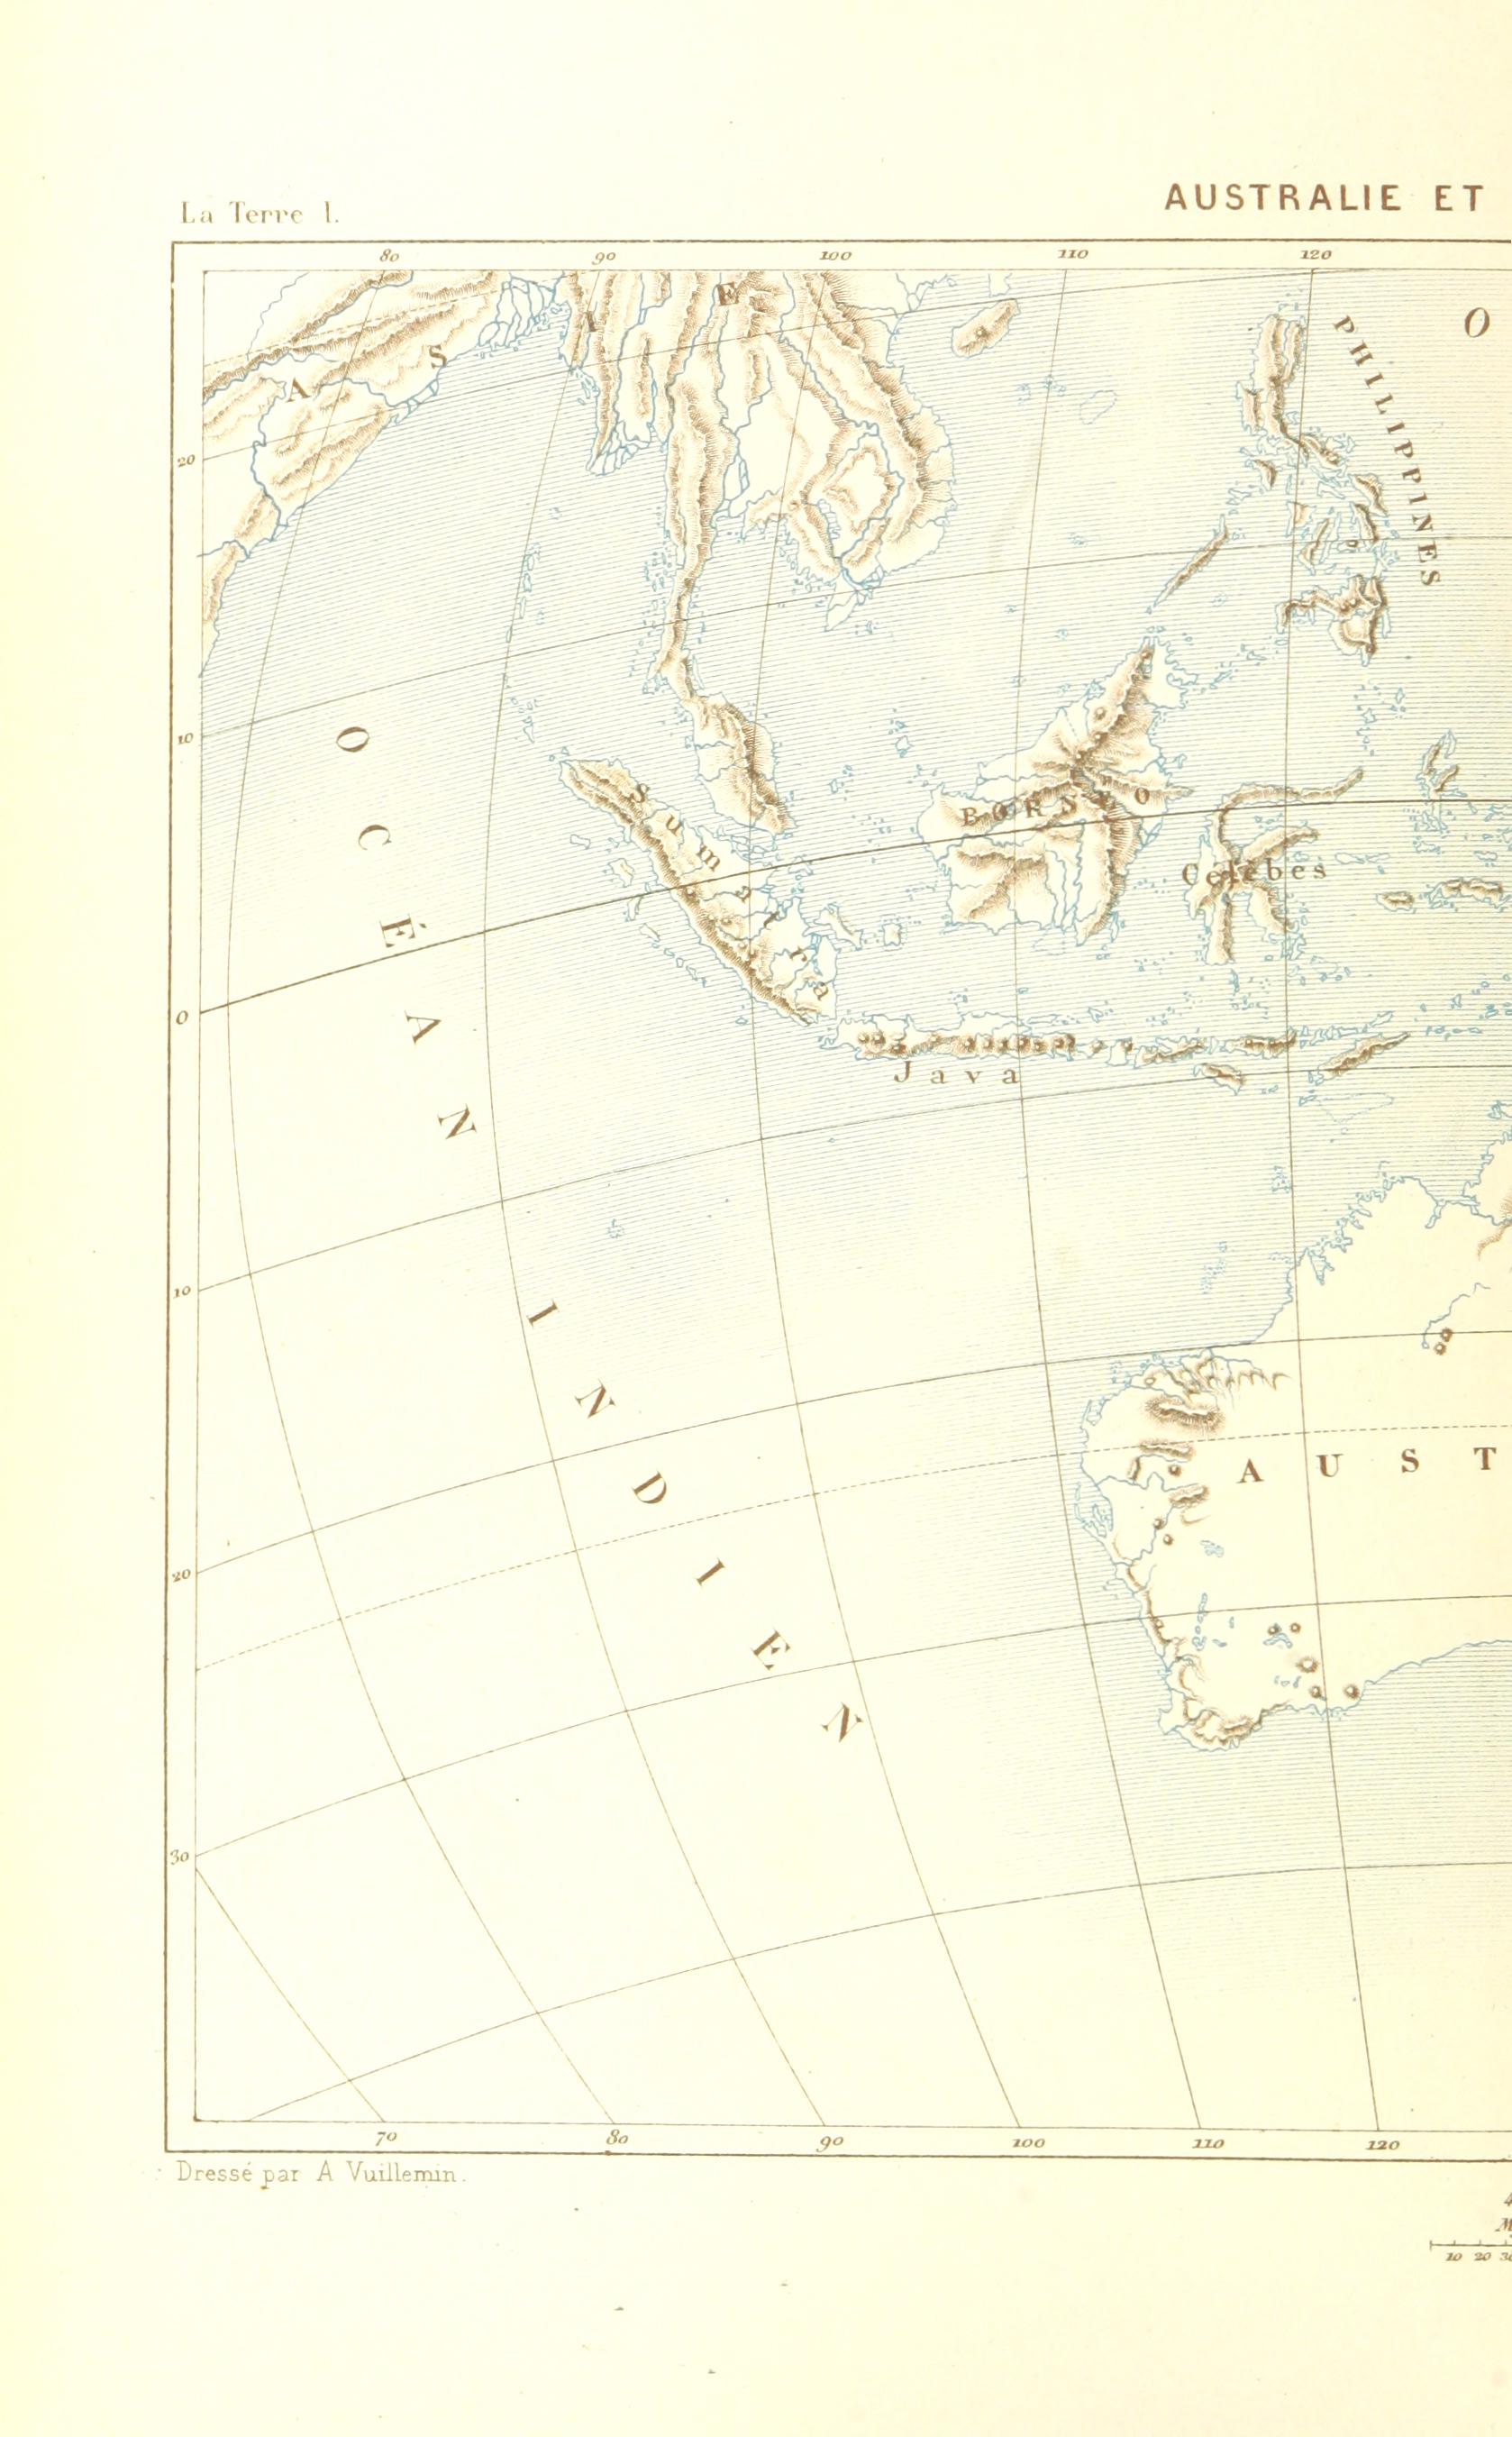 Les Continents De La Terre : continents, terre, File:134, Terre-, Description, Phénomènes, Globe., Continents., L'Ocean,, L'Atmosphere,, (11085393313).jpg, Wikimedia, Commons